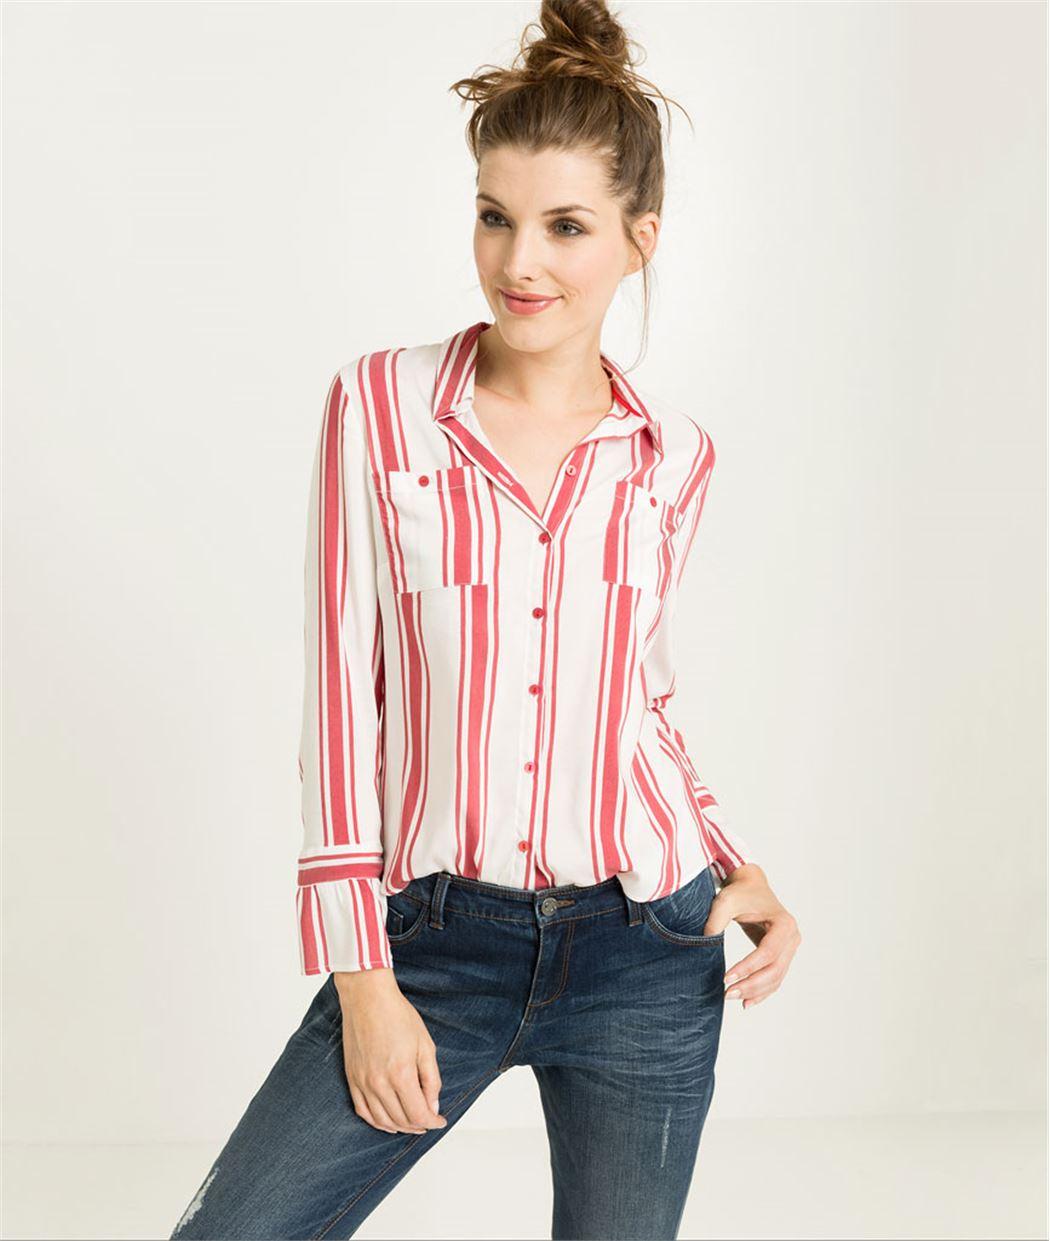 Chemise femme rayée rouge et blanc BLANC